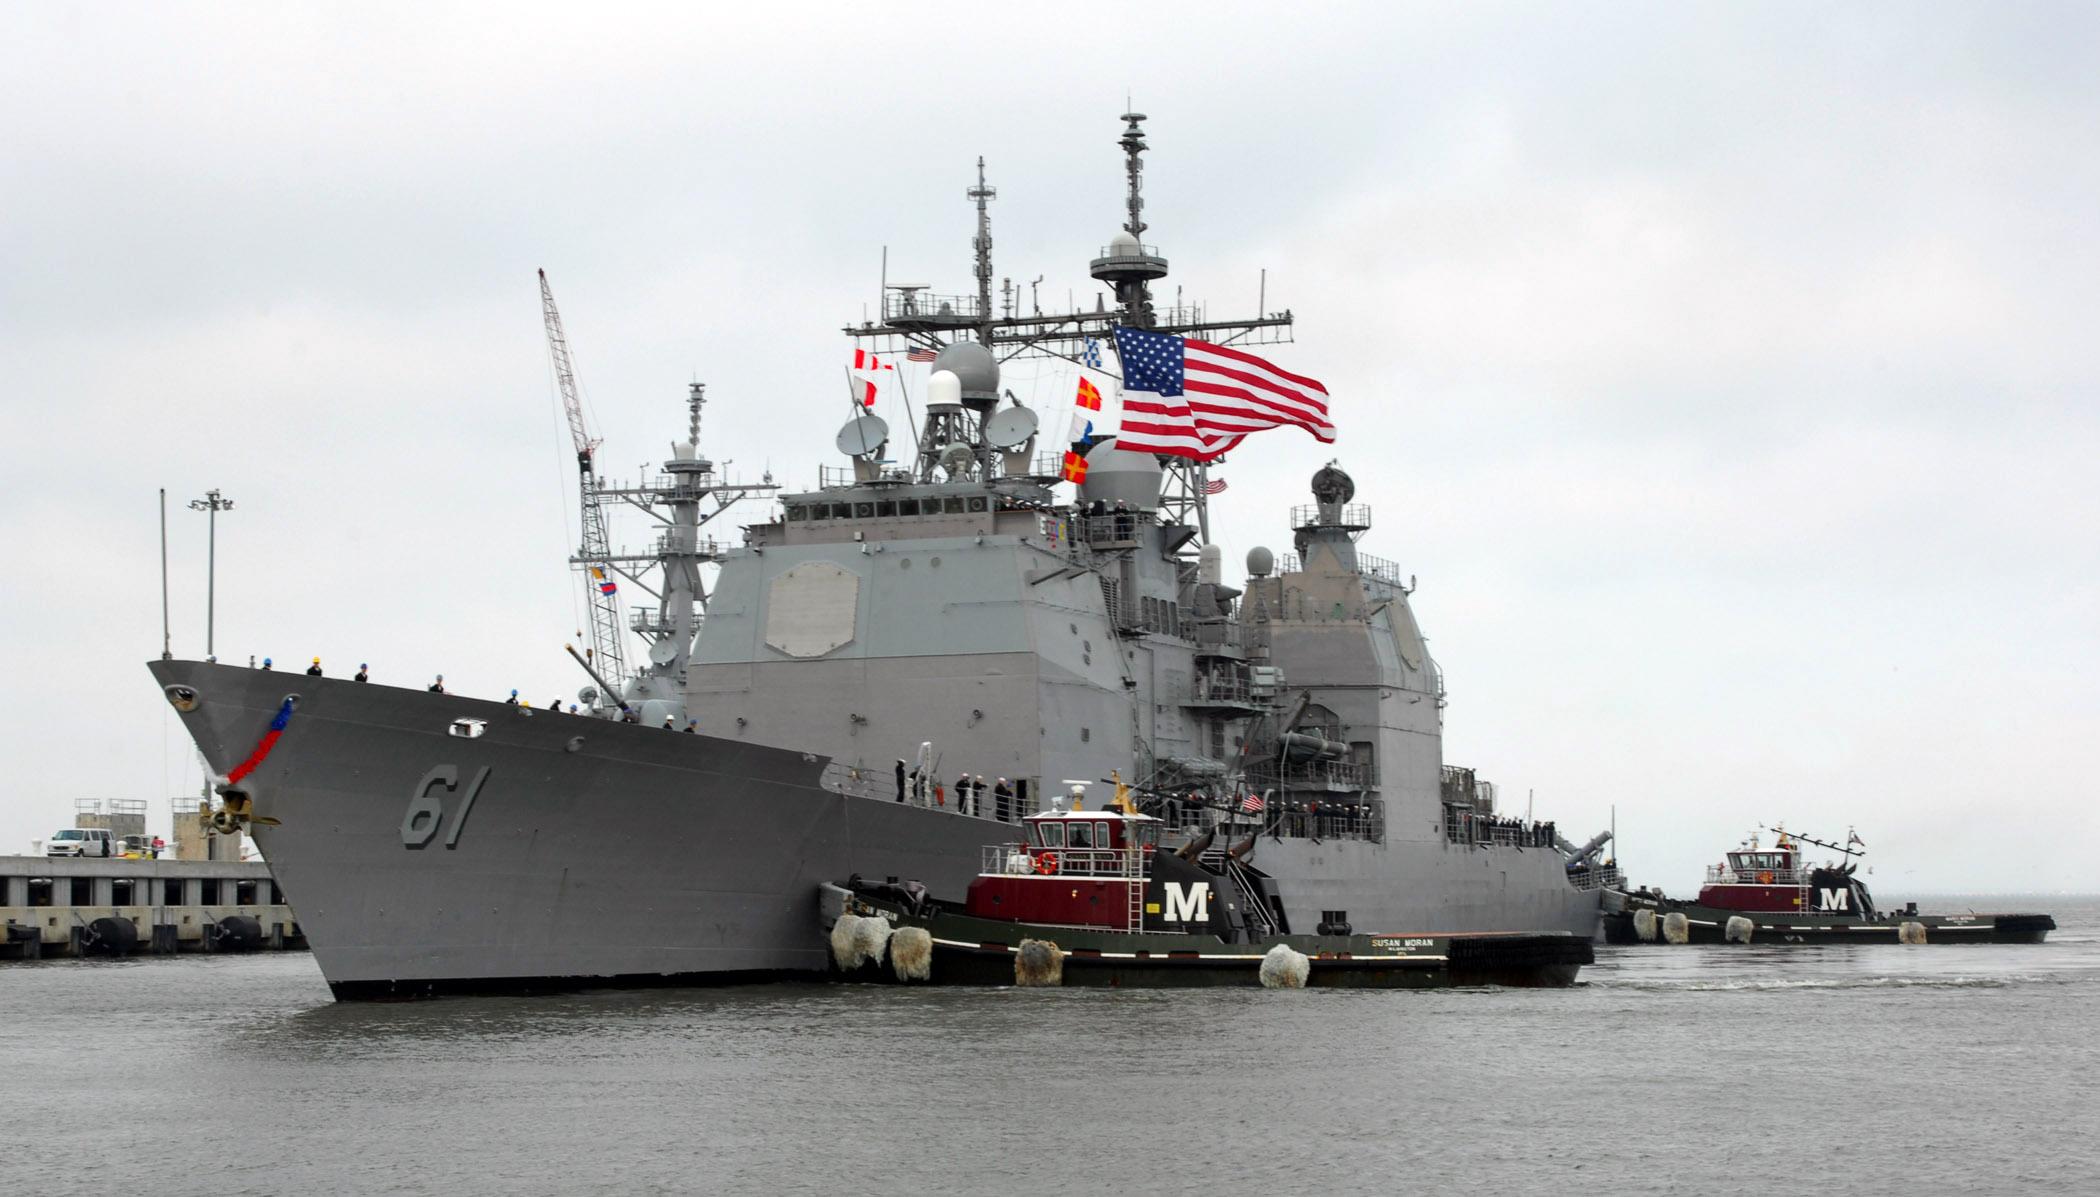 Fileus Navy L 005 Tugboats Escort The Ticonderoga